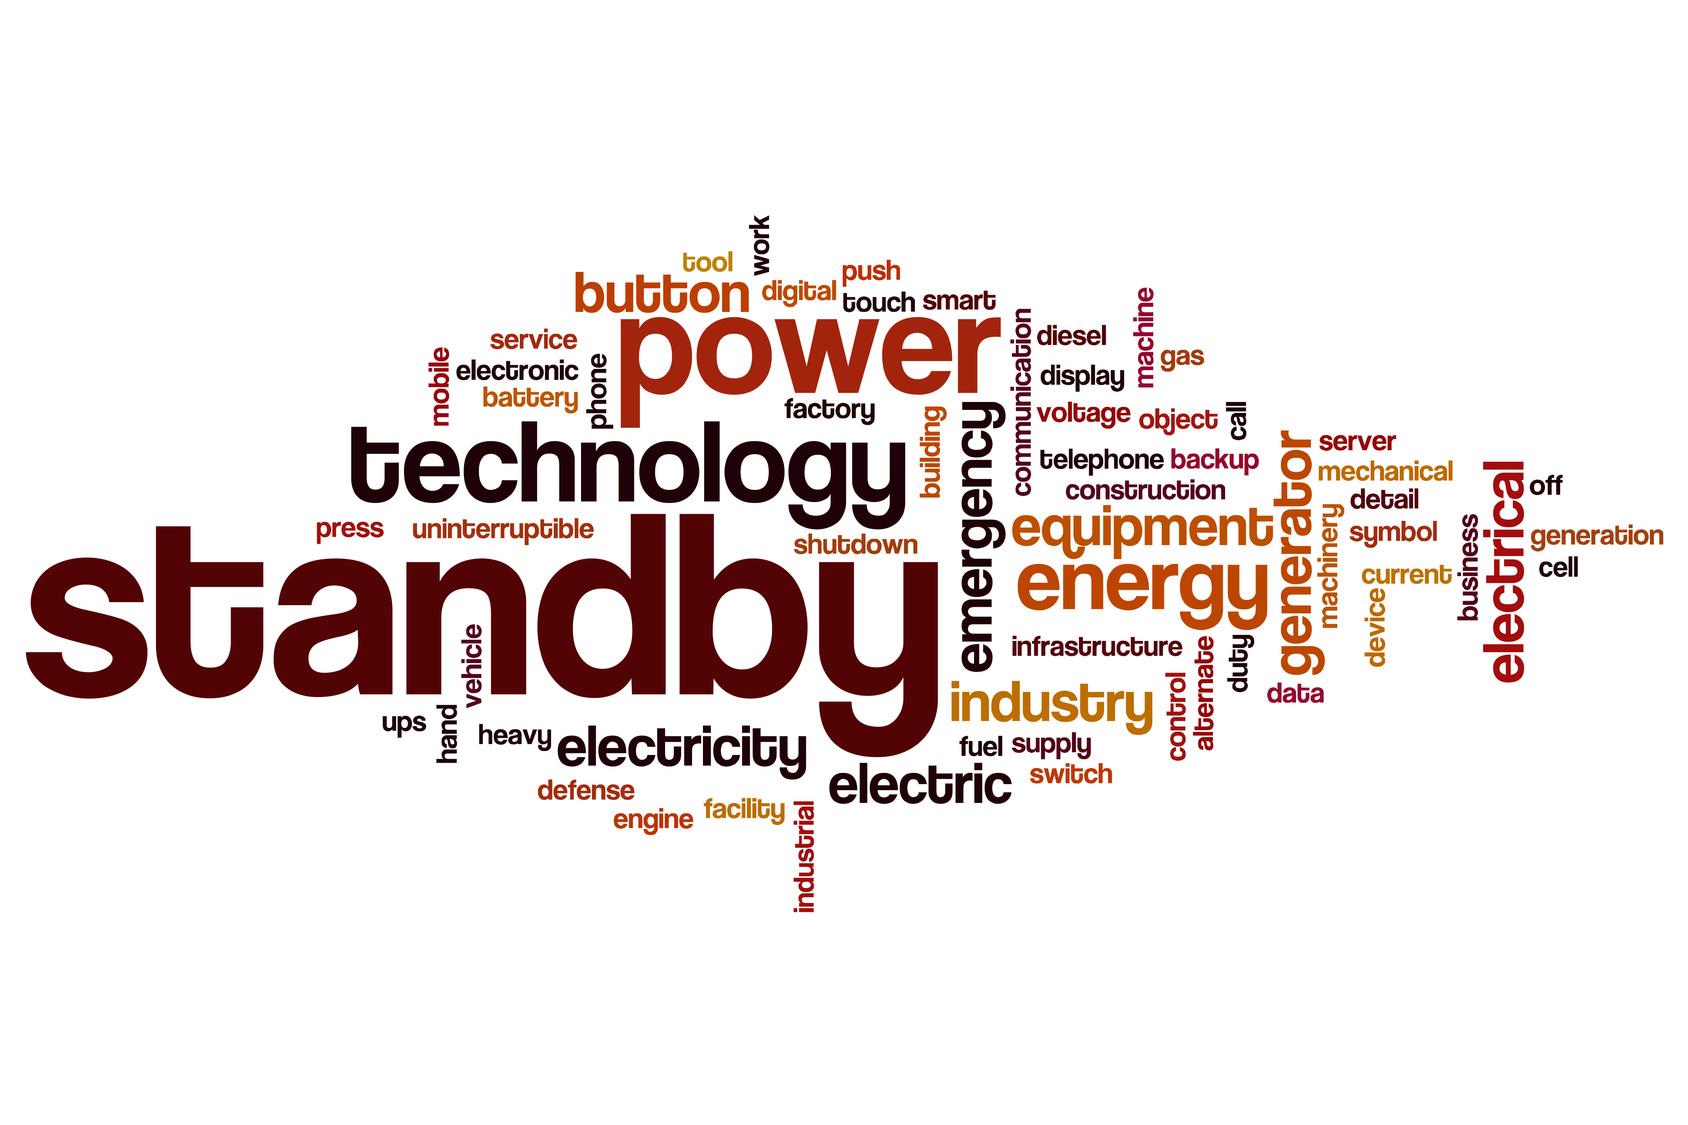 A power generator word cloud.